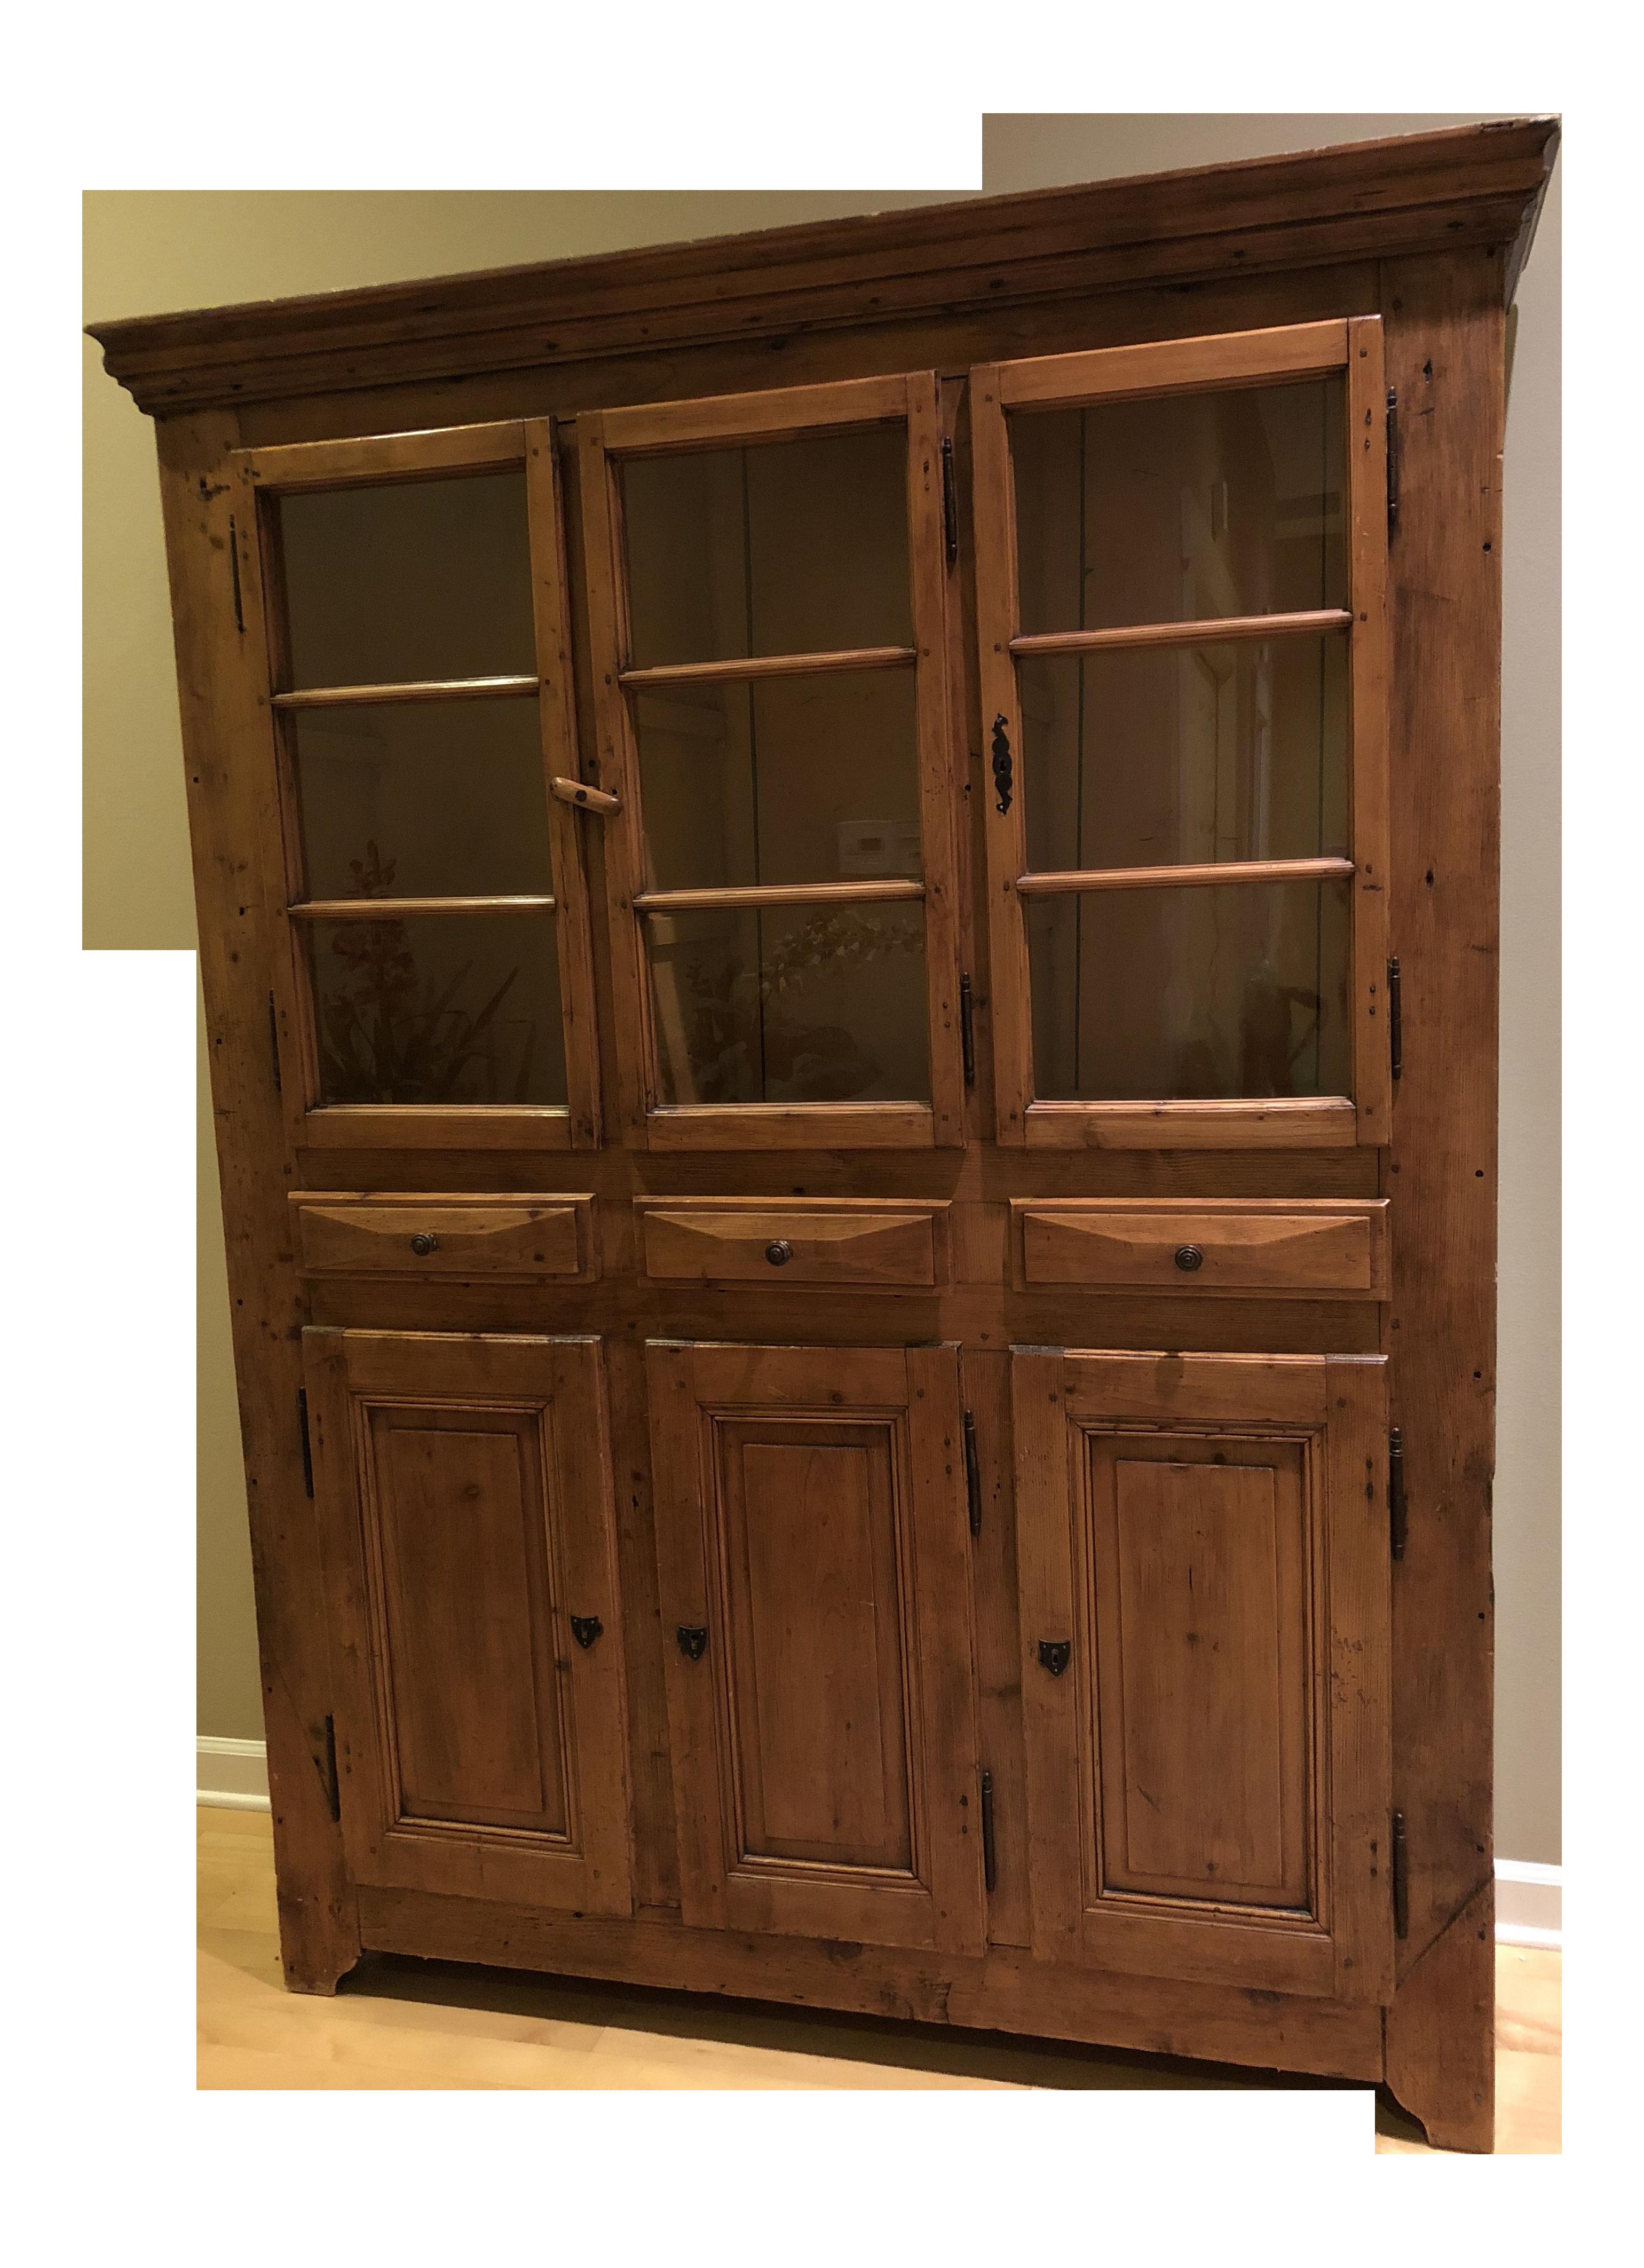 Vintage Camard Dimer French Display Hutch Cabinet